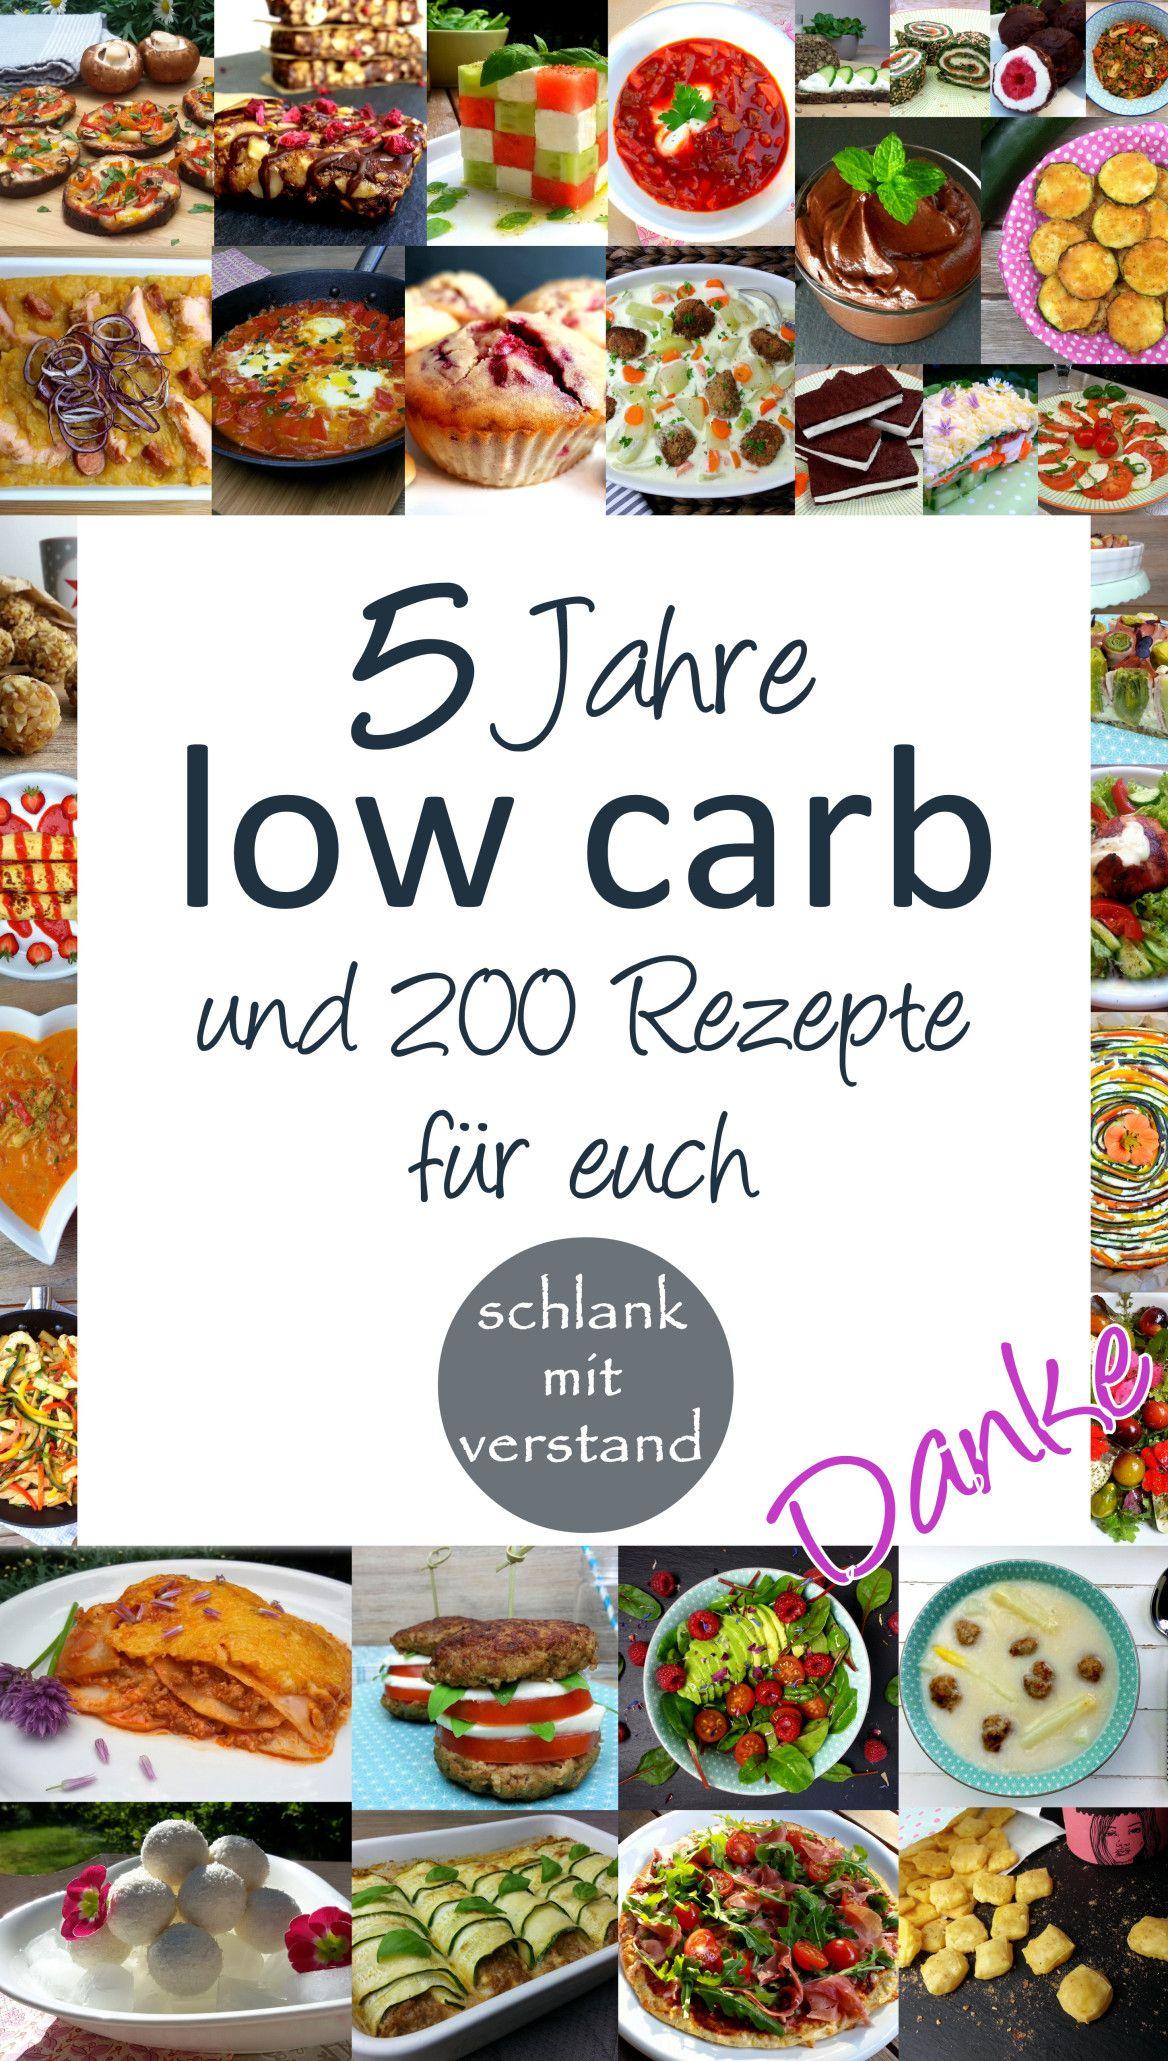 low carb Gemüsepuffer #nocarbdiets